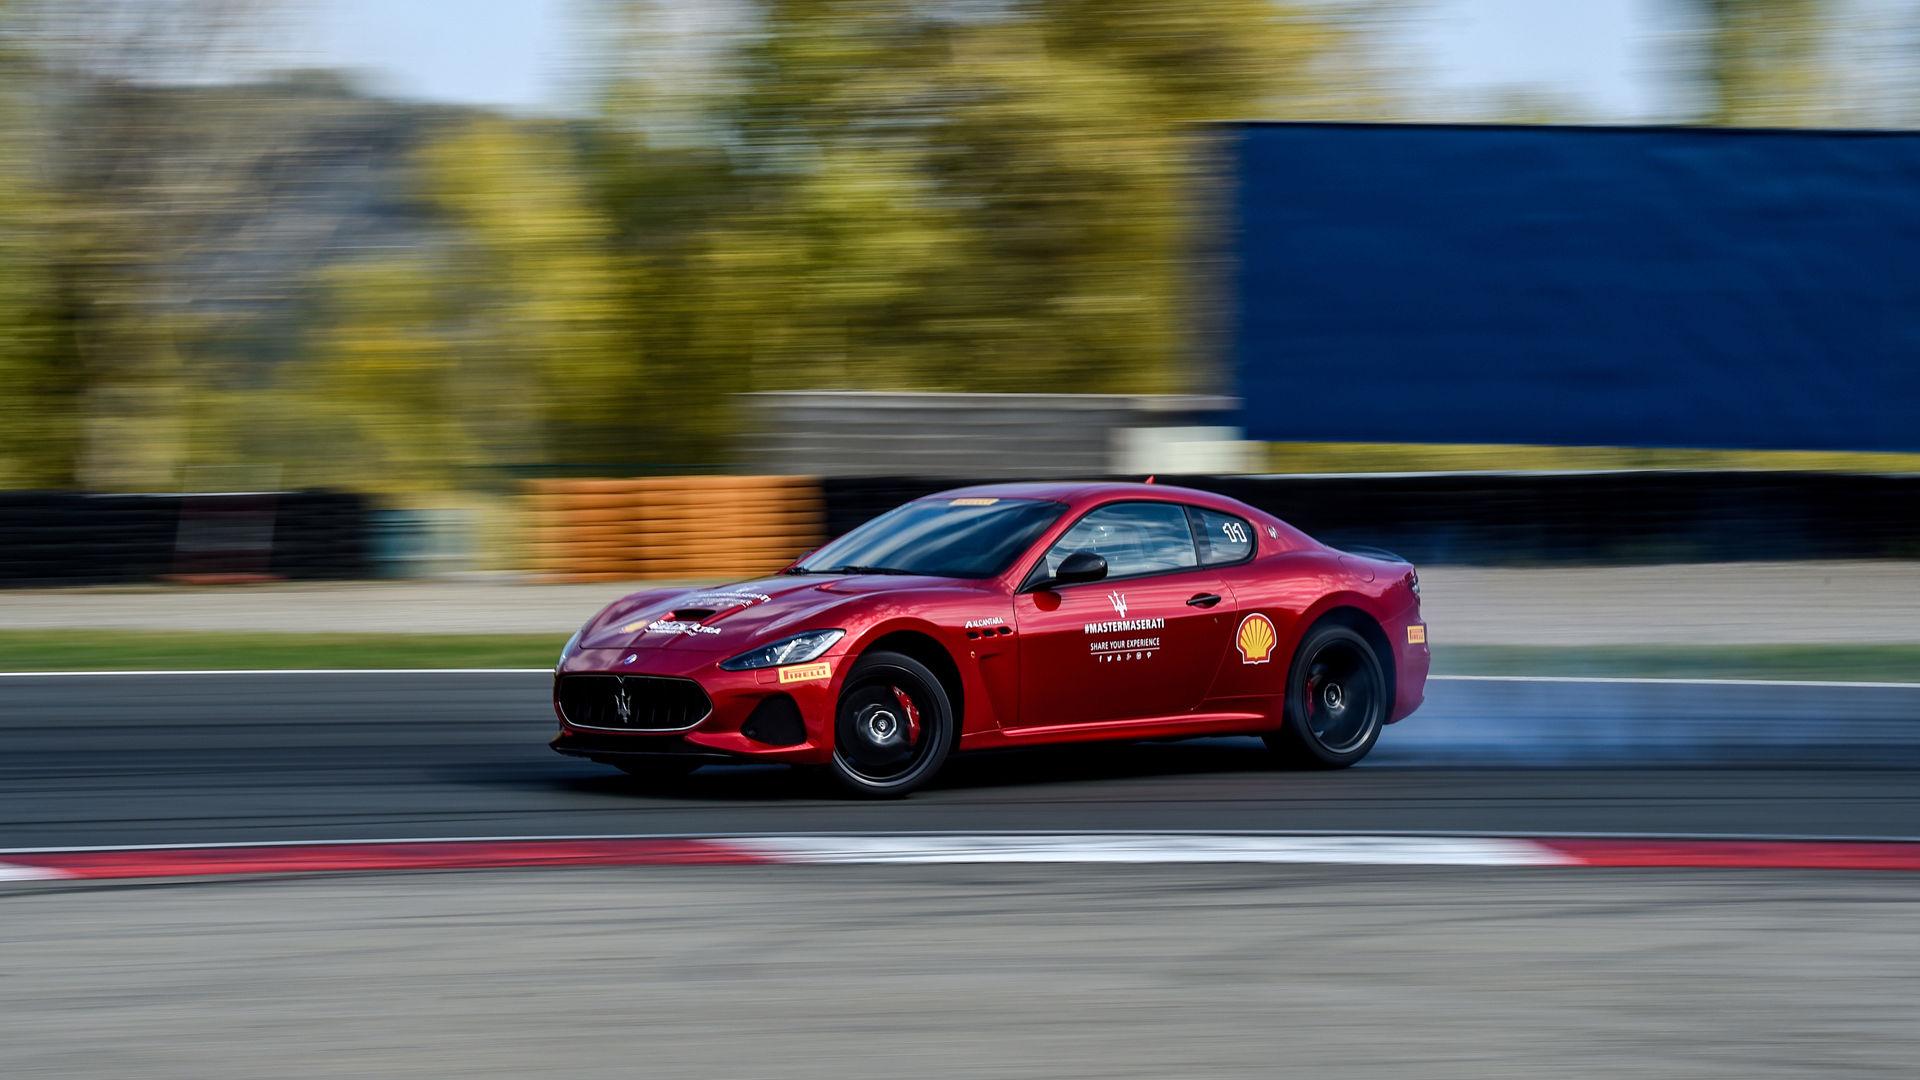 Maserati GranTurismo with partners' logos running on a circuit